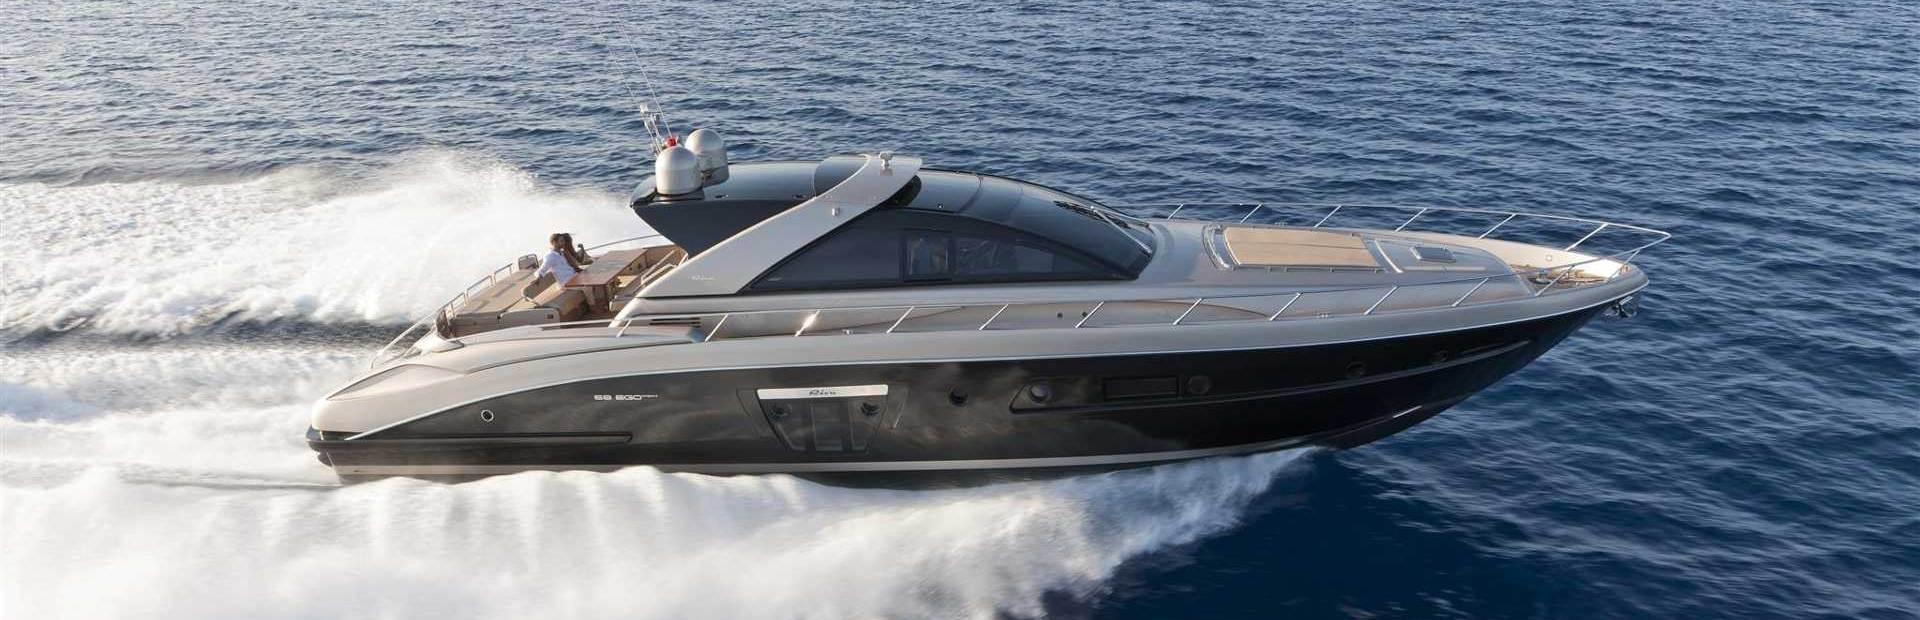 68' Ego Super Yacht Charter